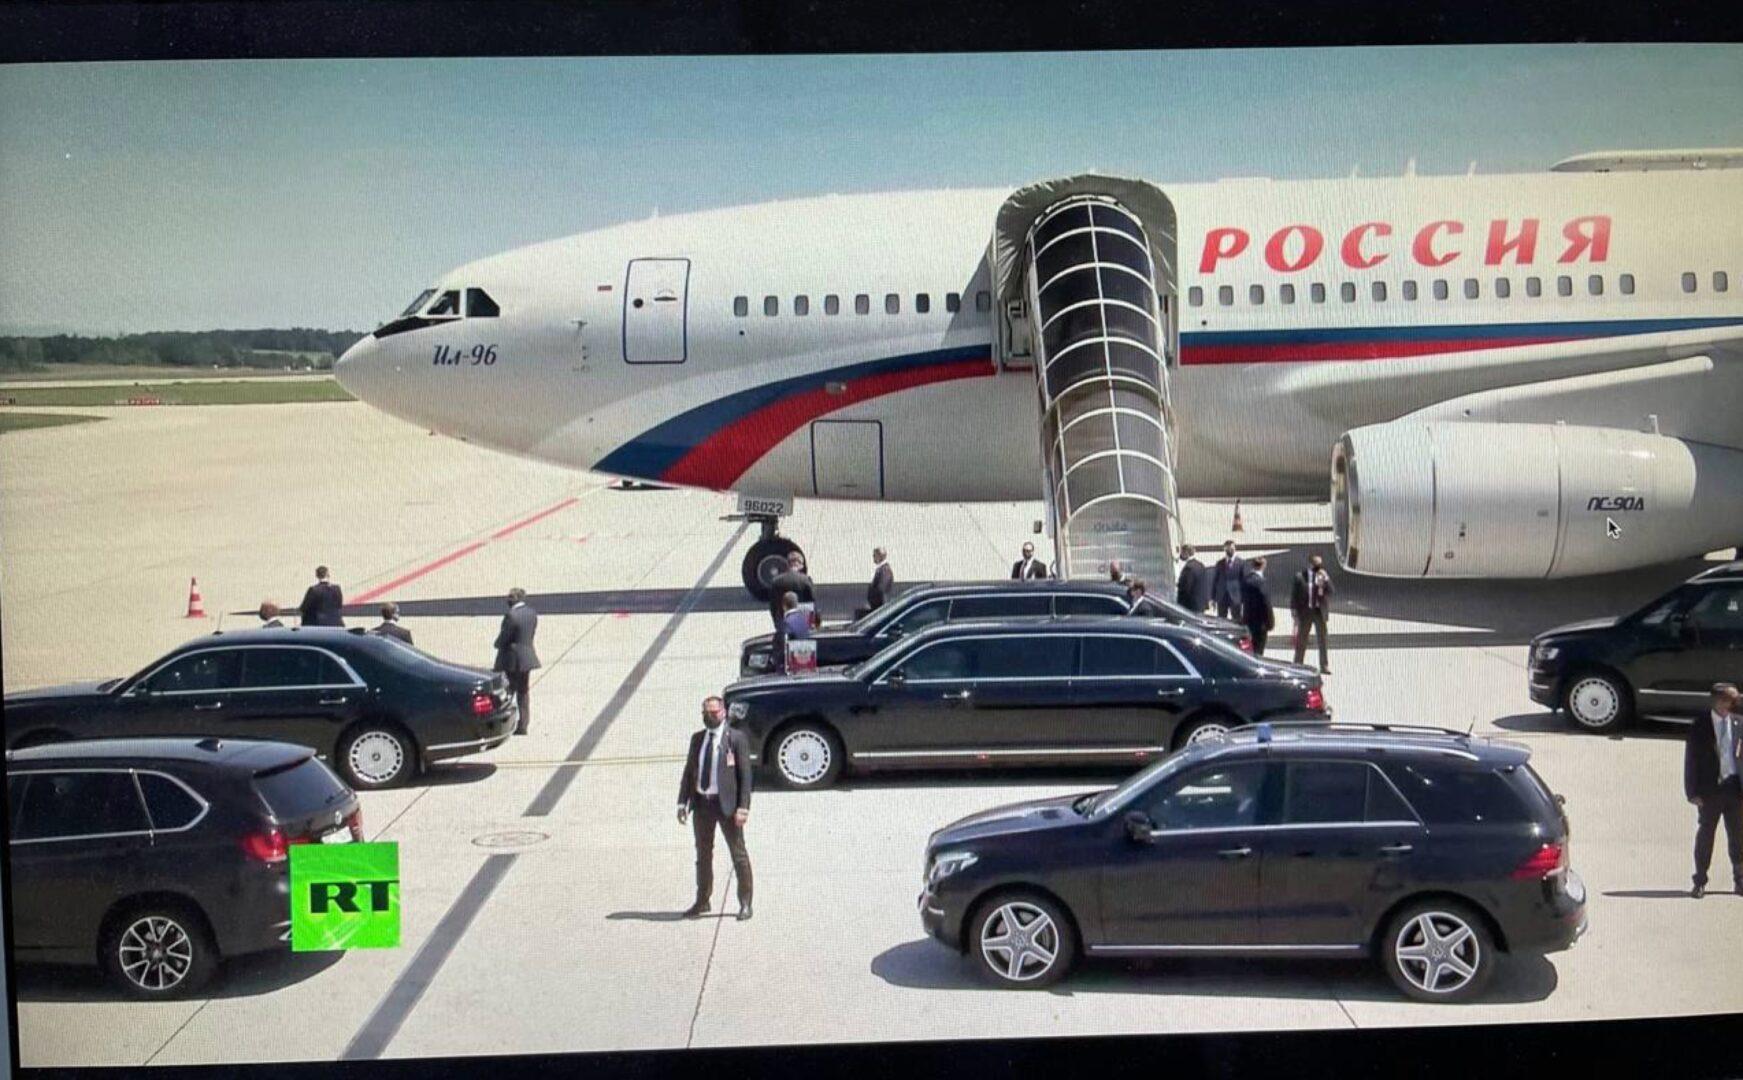 Suita lui Vladimir Putin